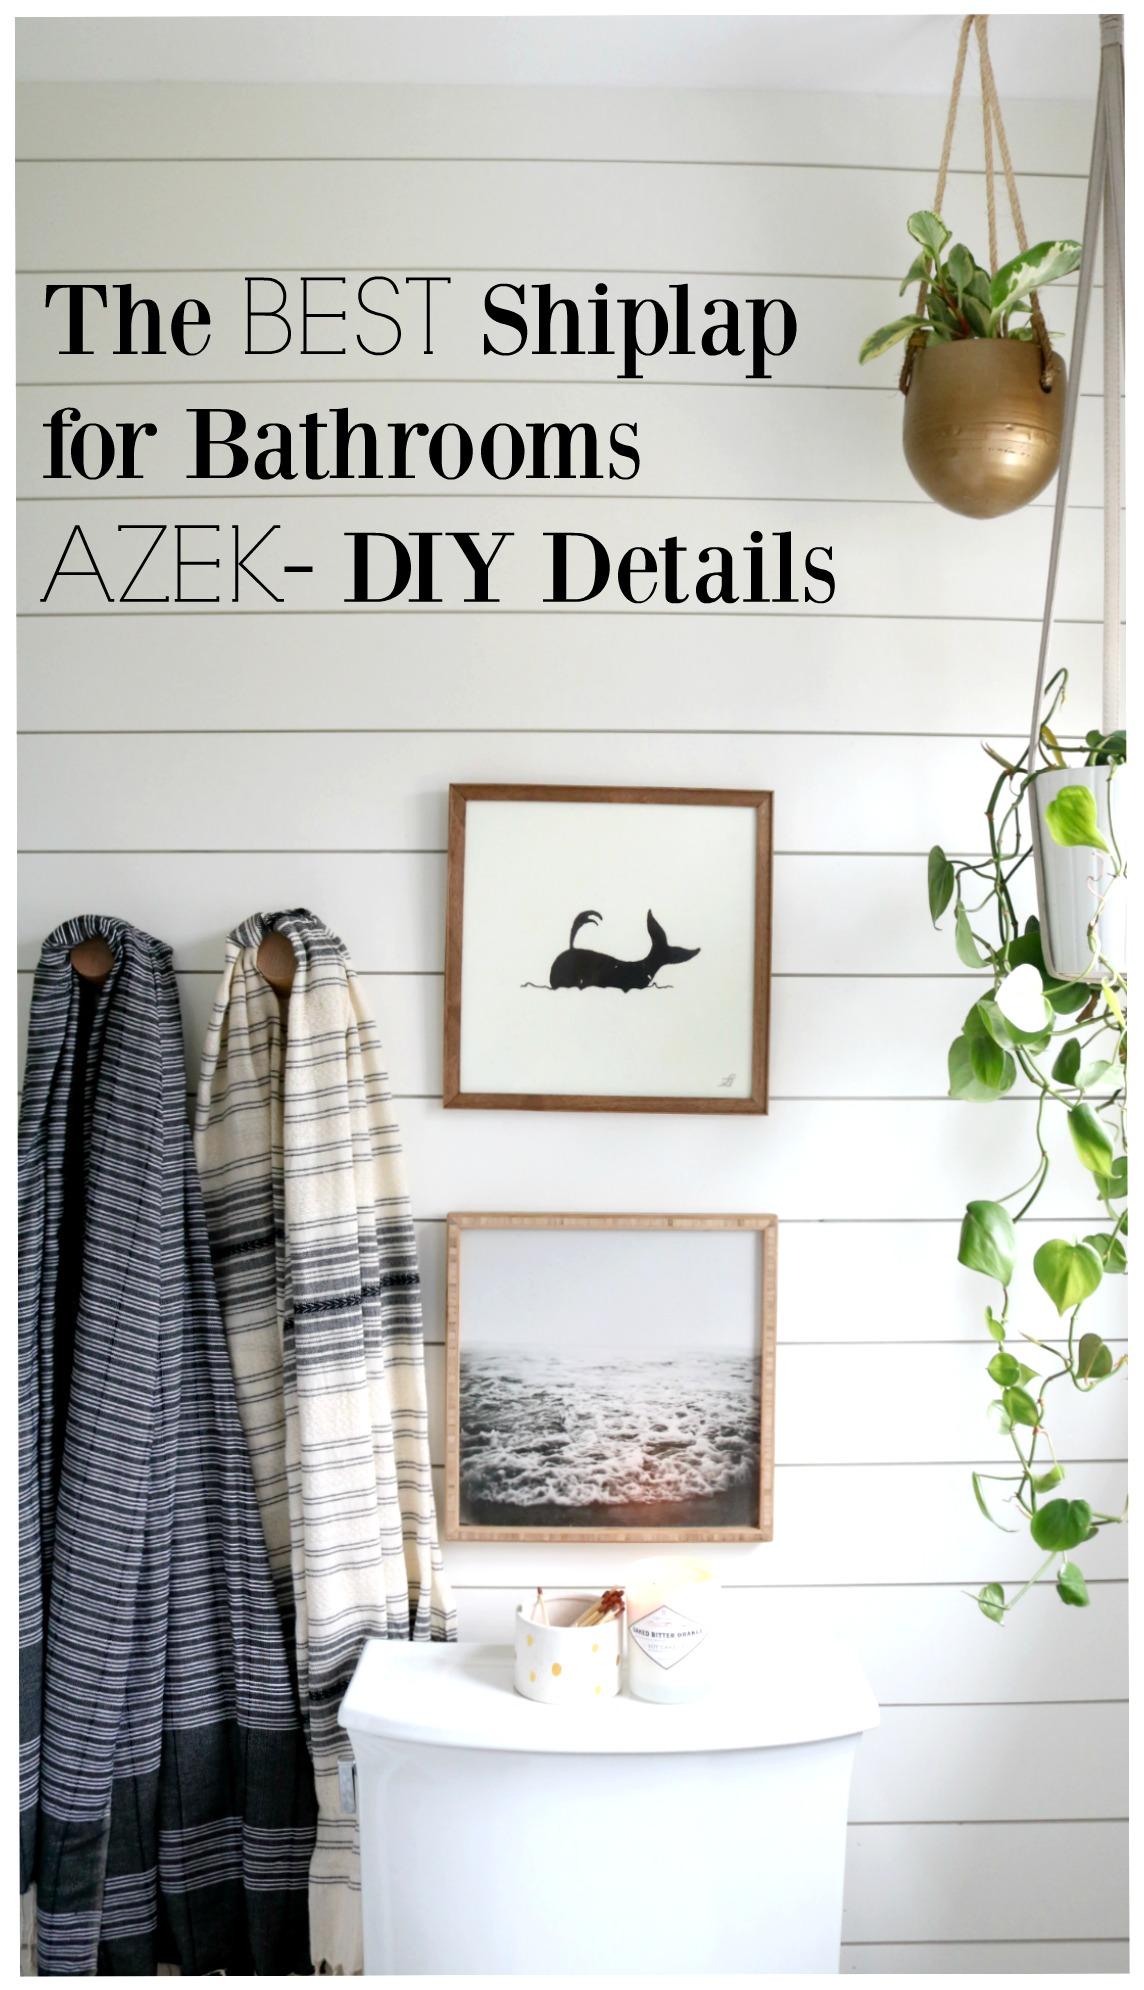 The BEST Shiplap for Bathrooms AZEK DIY Details